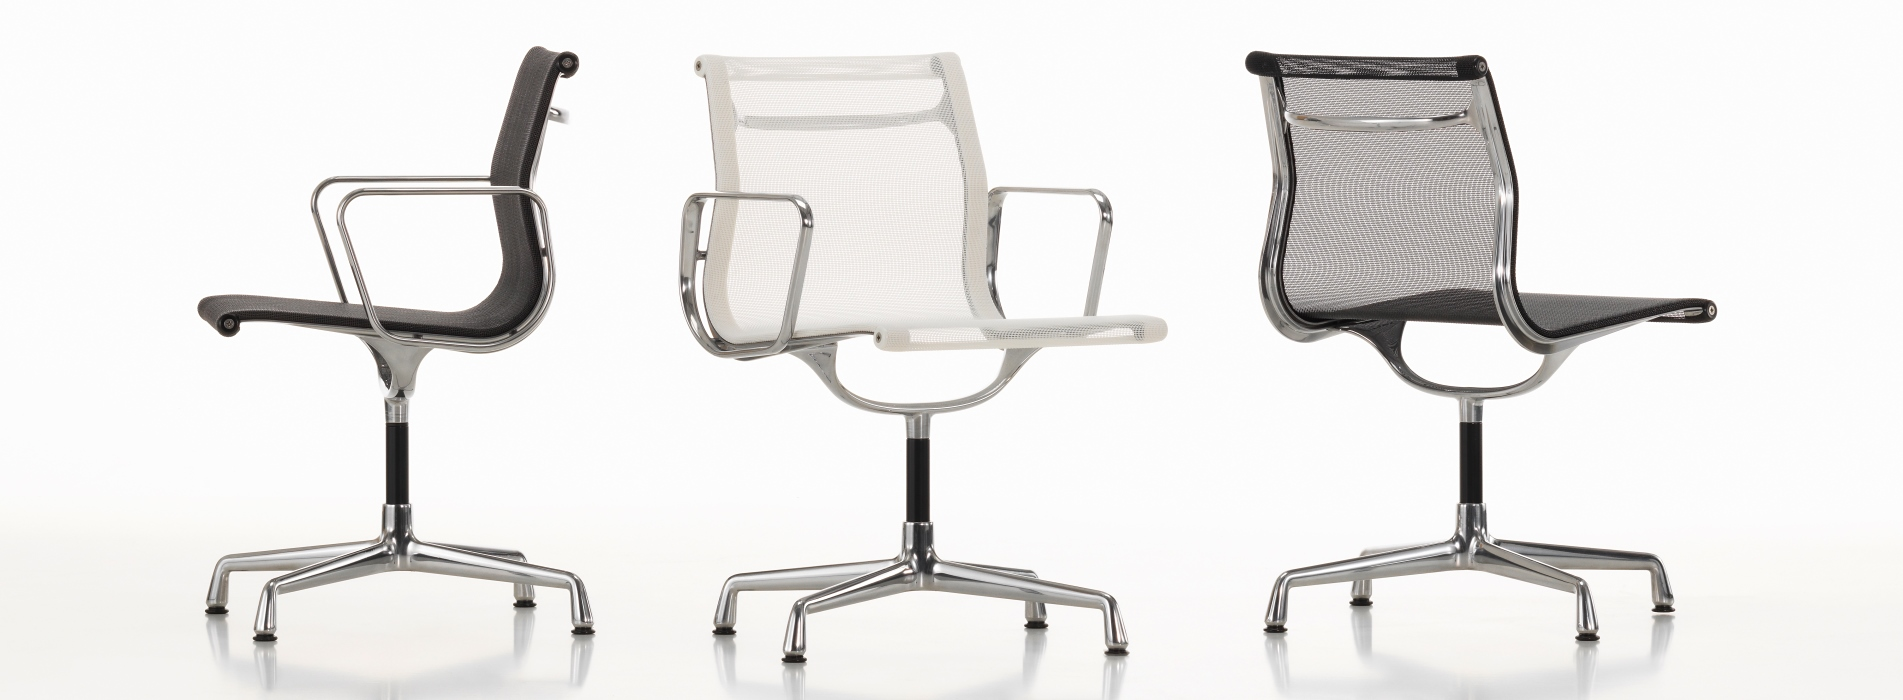 inside-concept-mobilier-design-bureau-banner-2